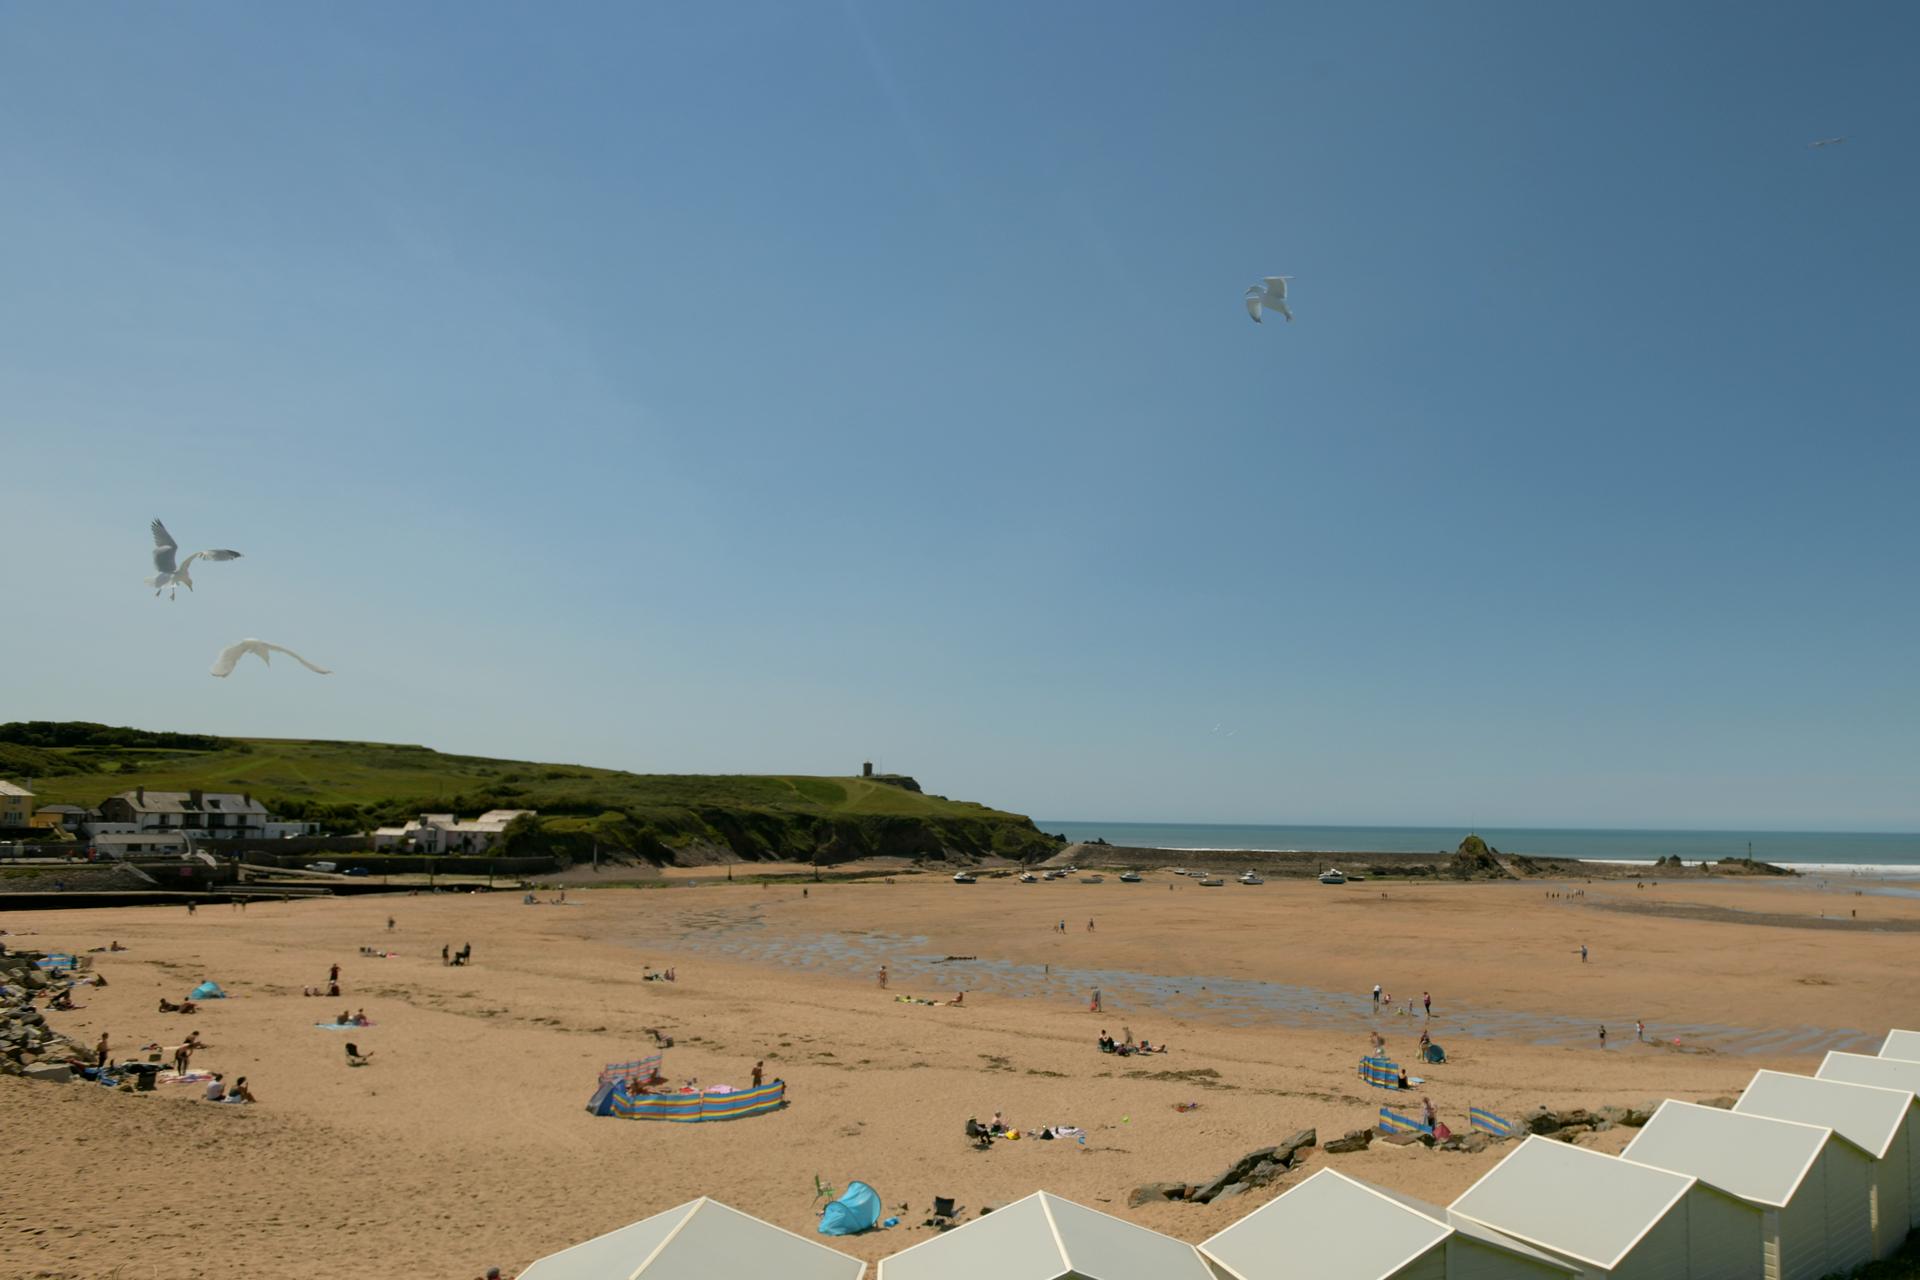 Summerleaze beach in Bude north Cornwall